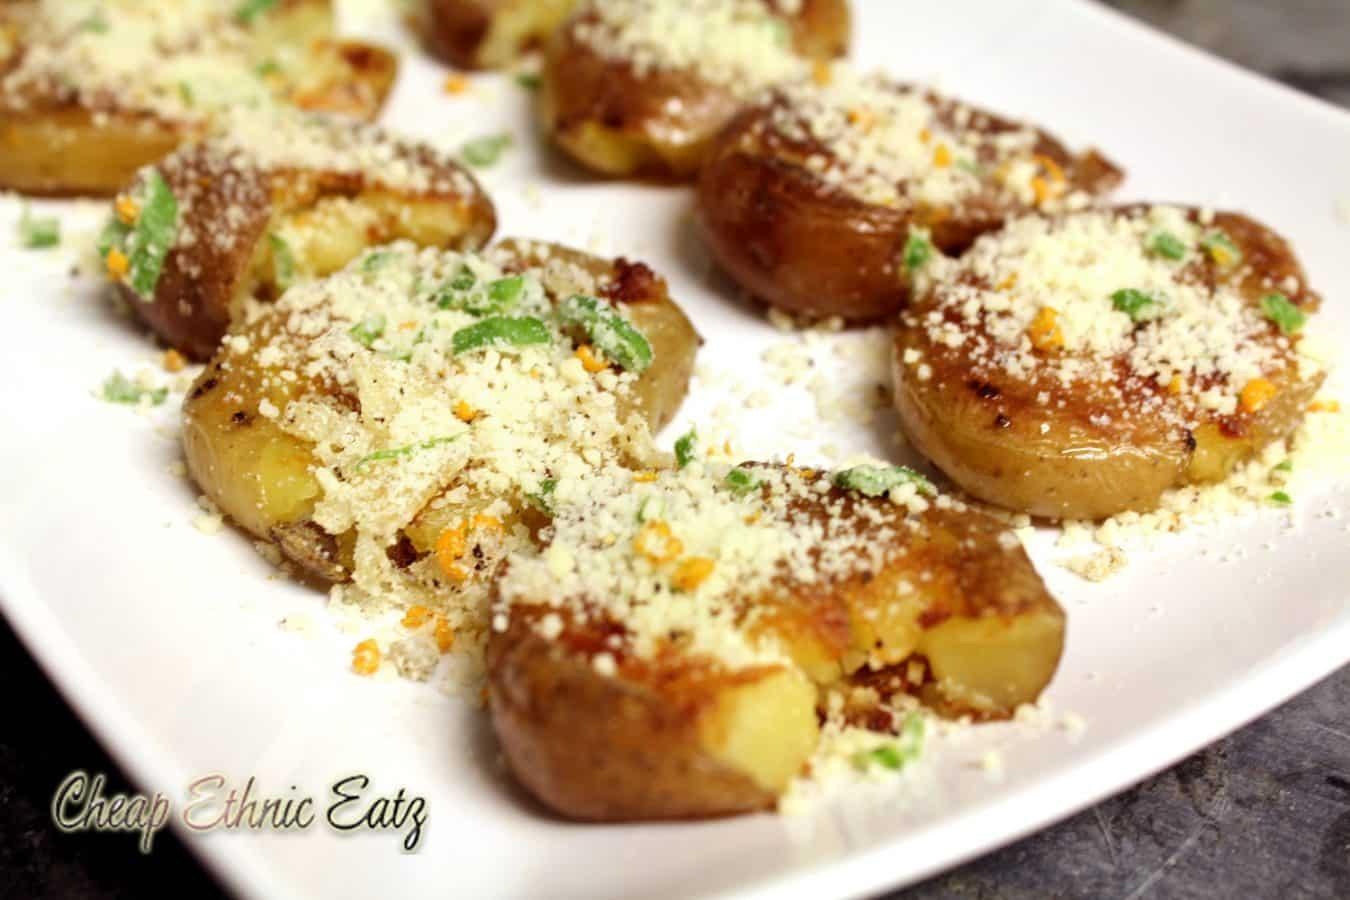 Pan Fried Smashed Potatoes